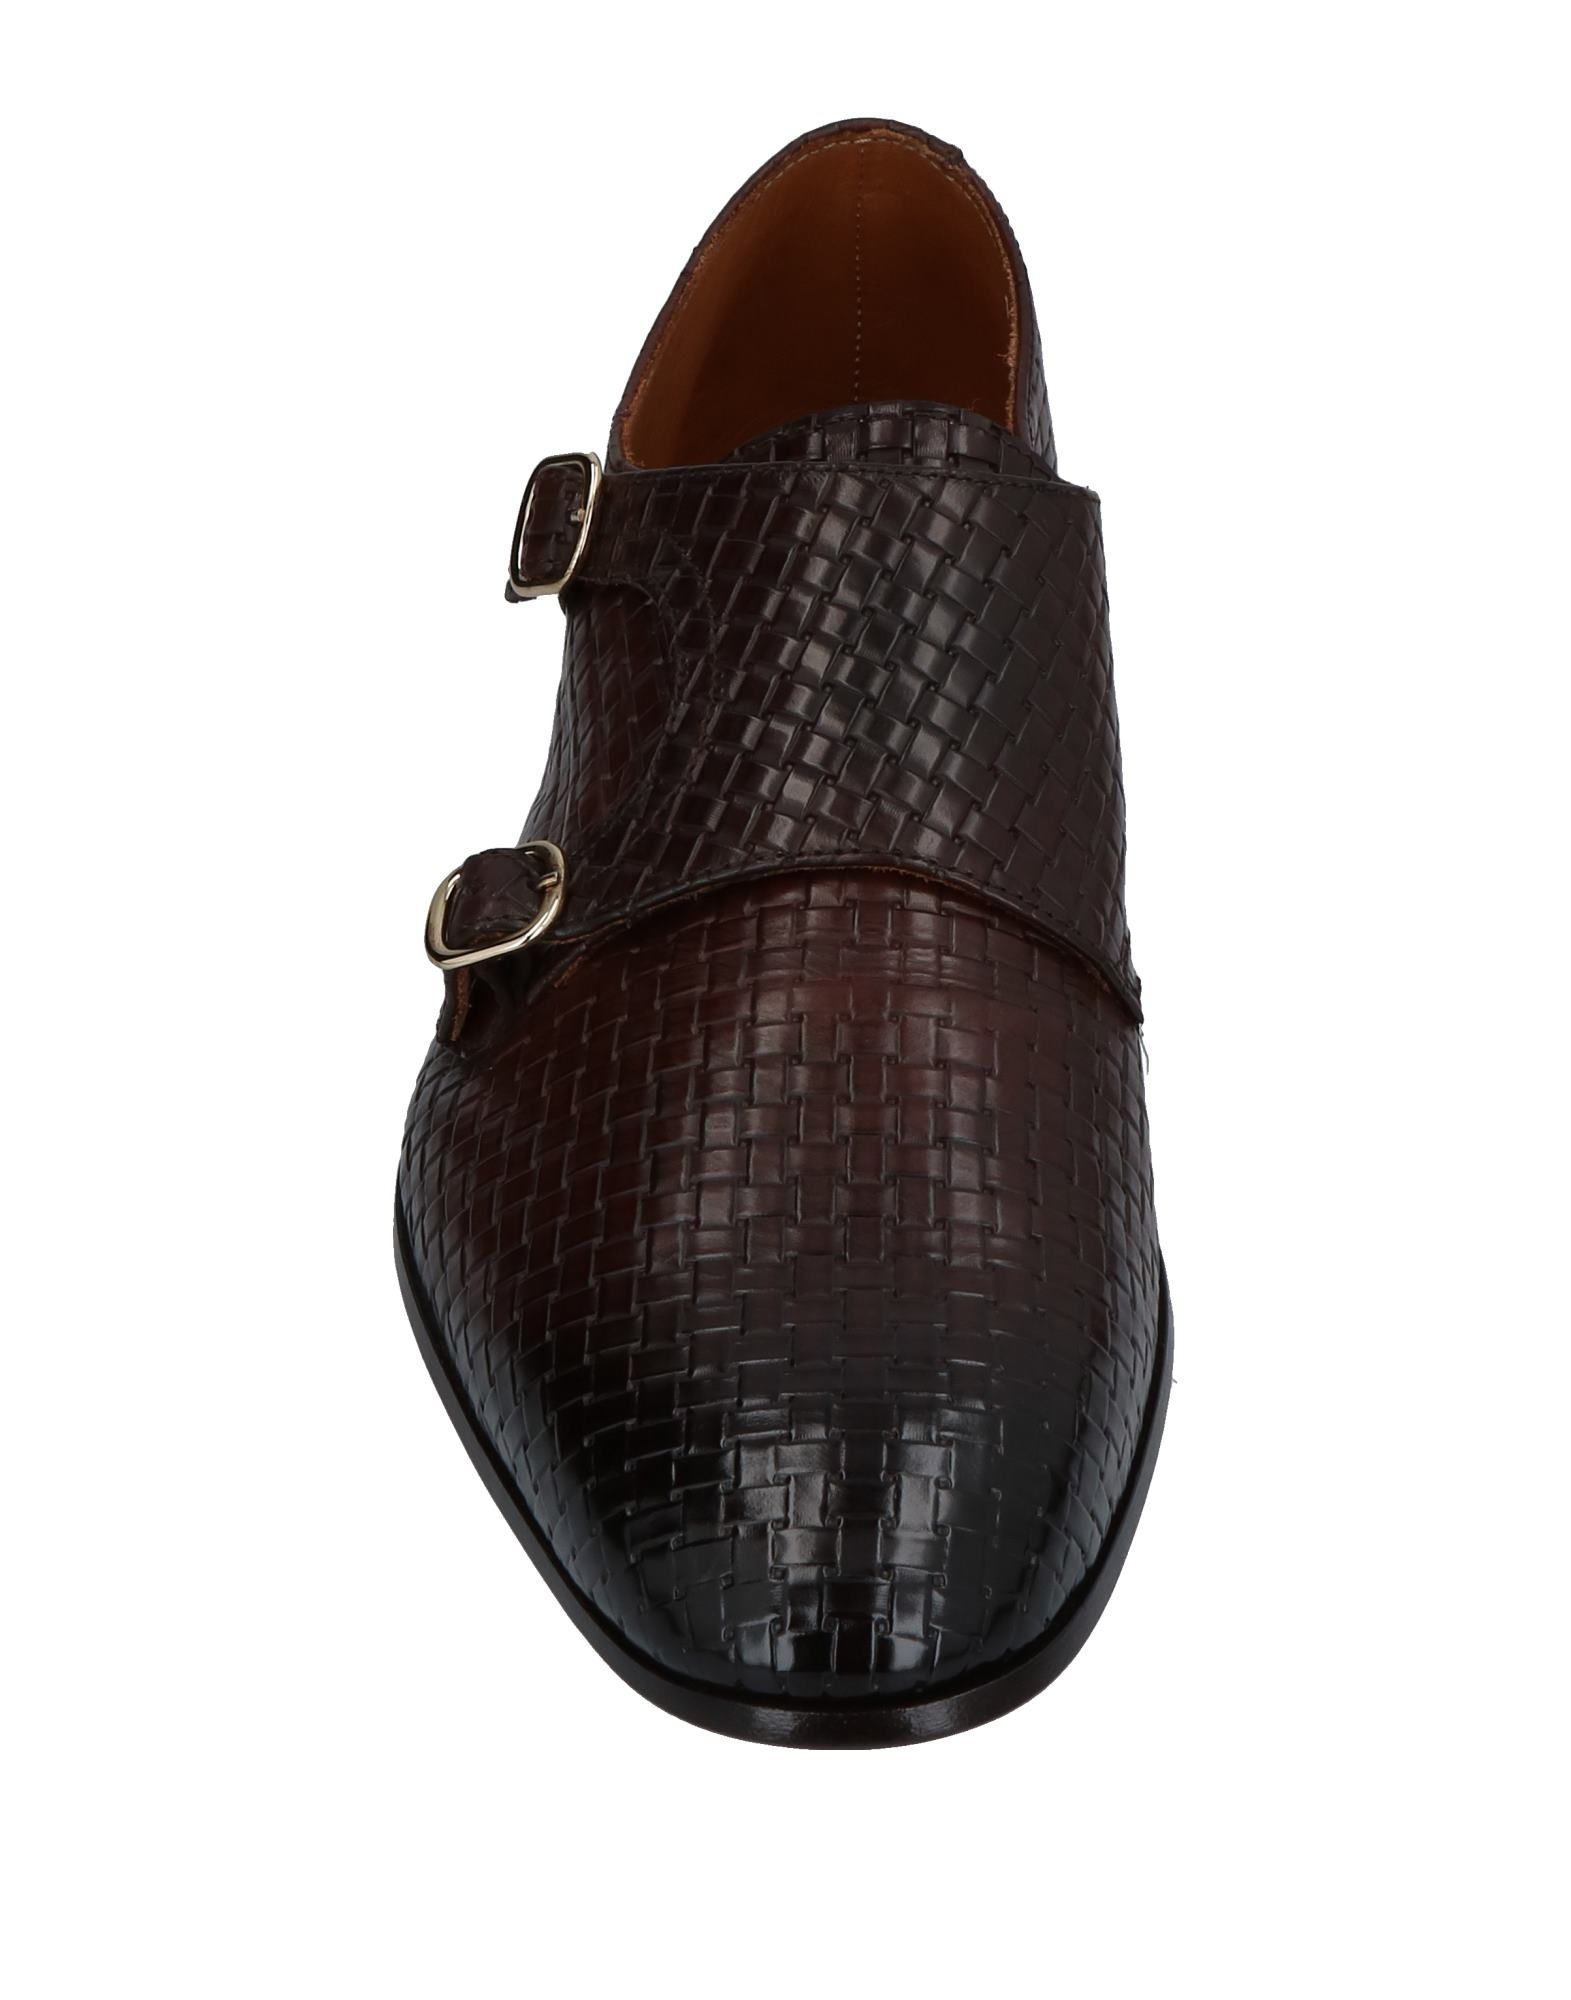 Herren Doucal's Mokassins Herren   11369725QO Heiße Schuhe a4e0a6